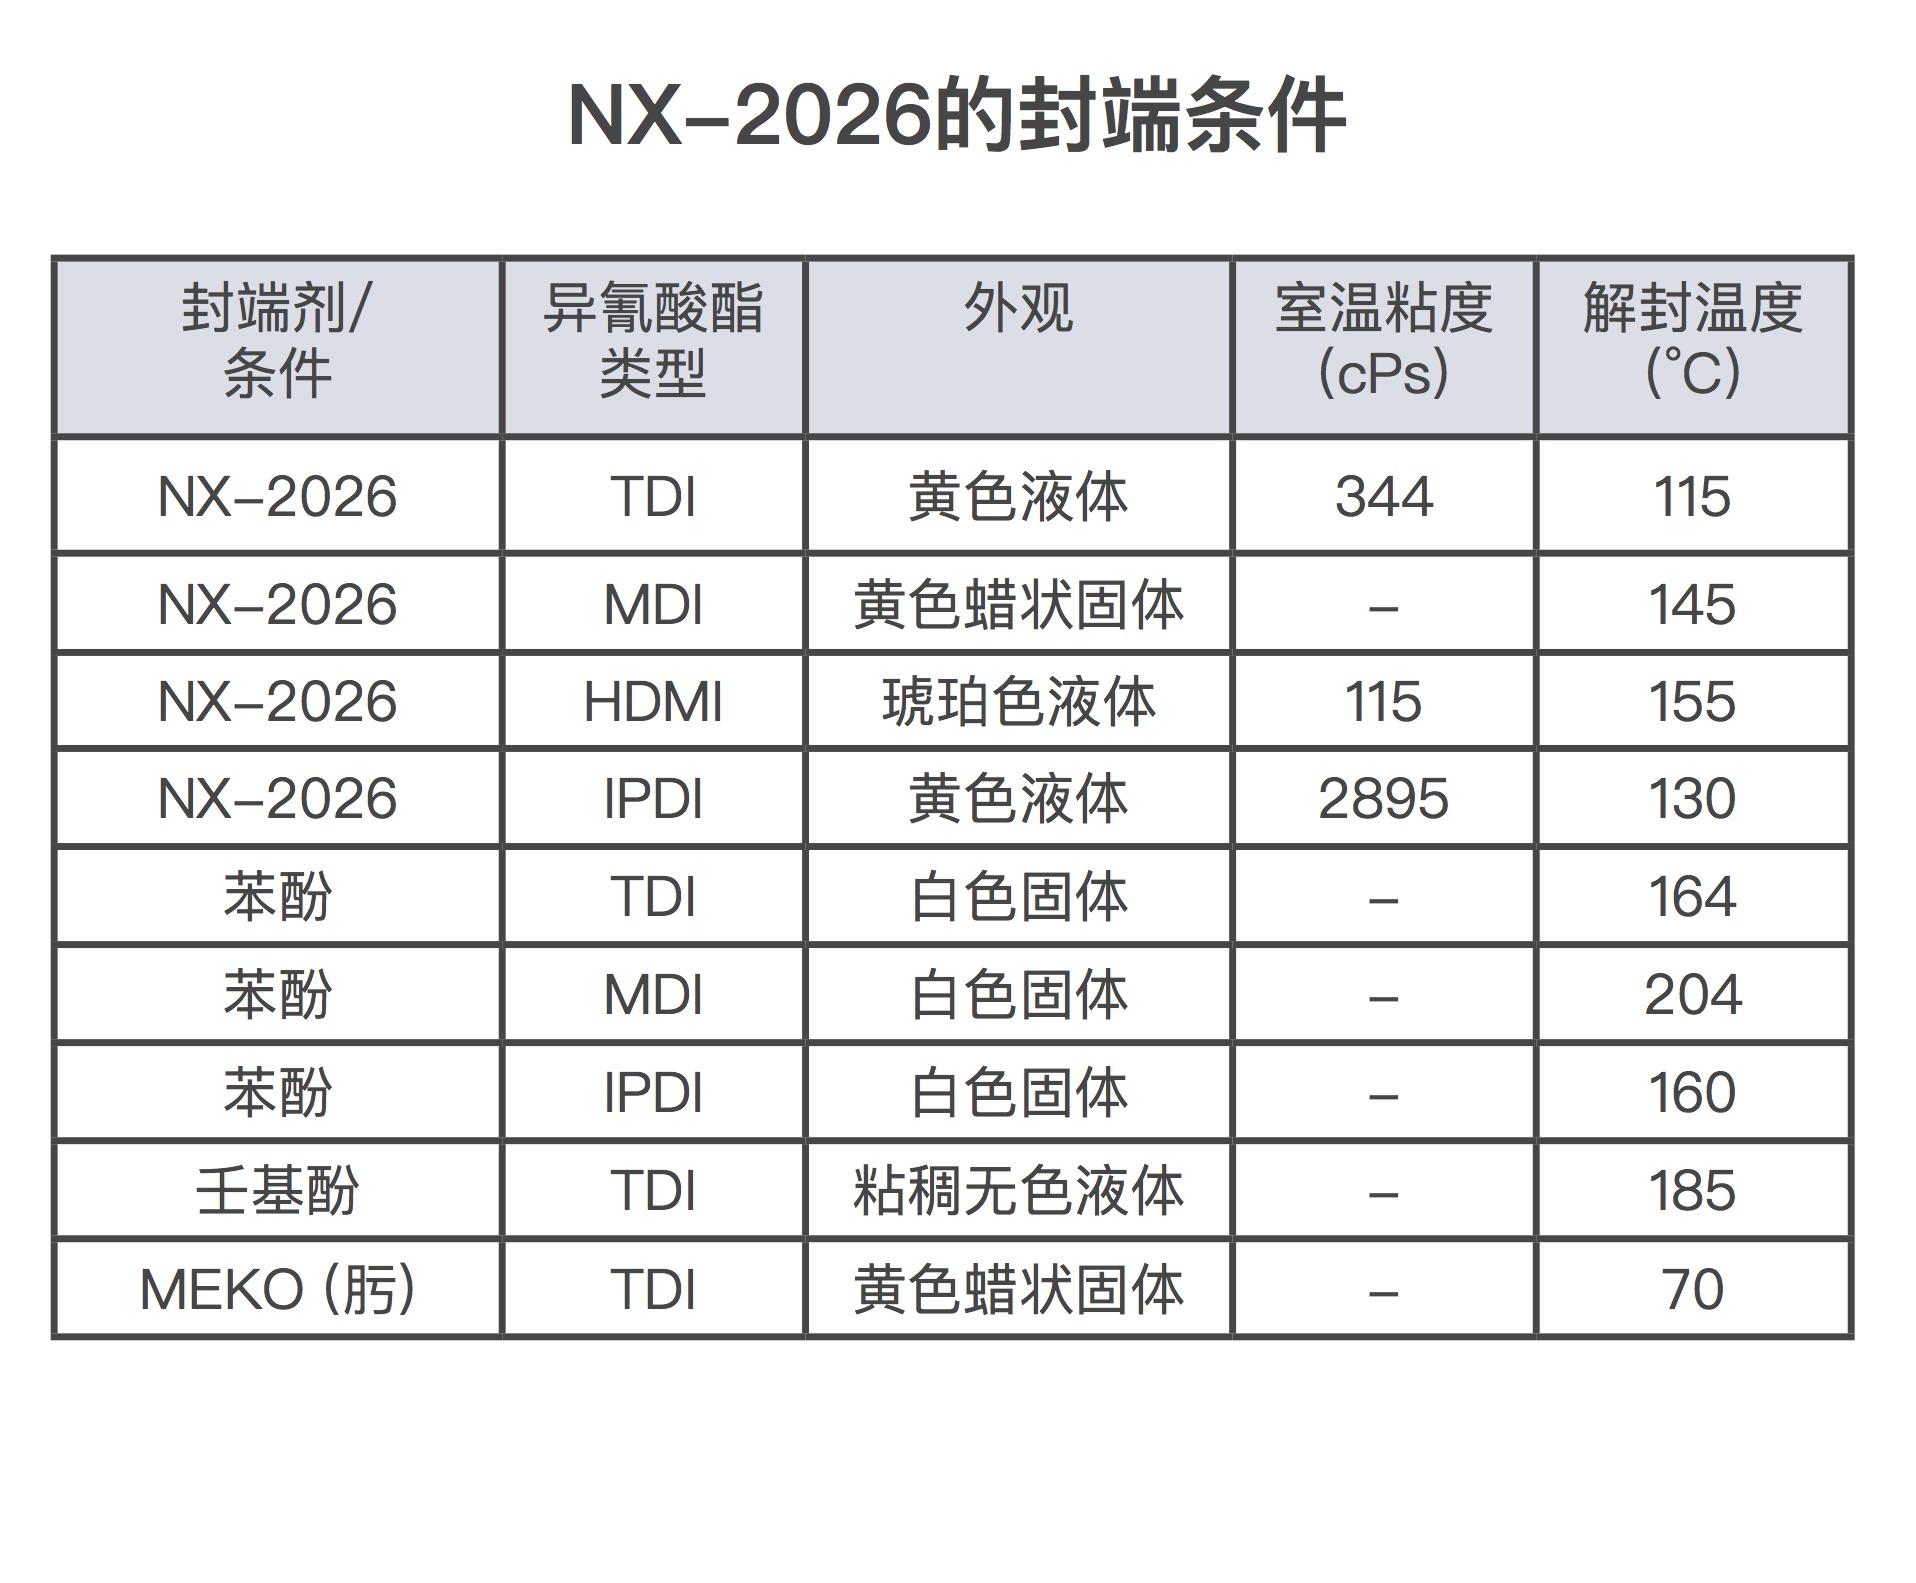 NX-2026与各种异氰酸酯搭配的解封温度